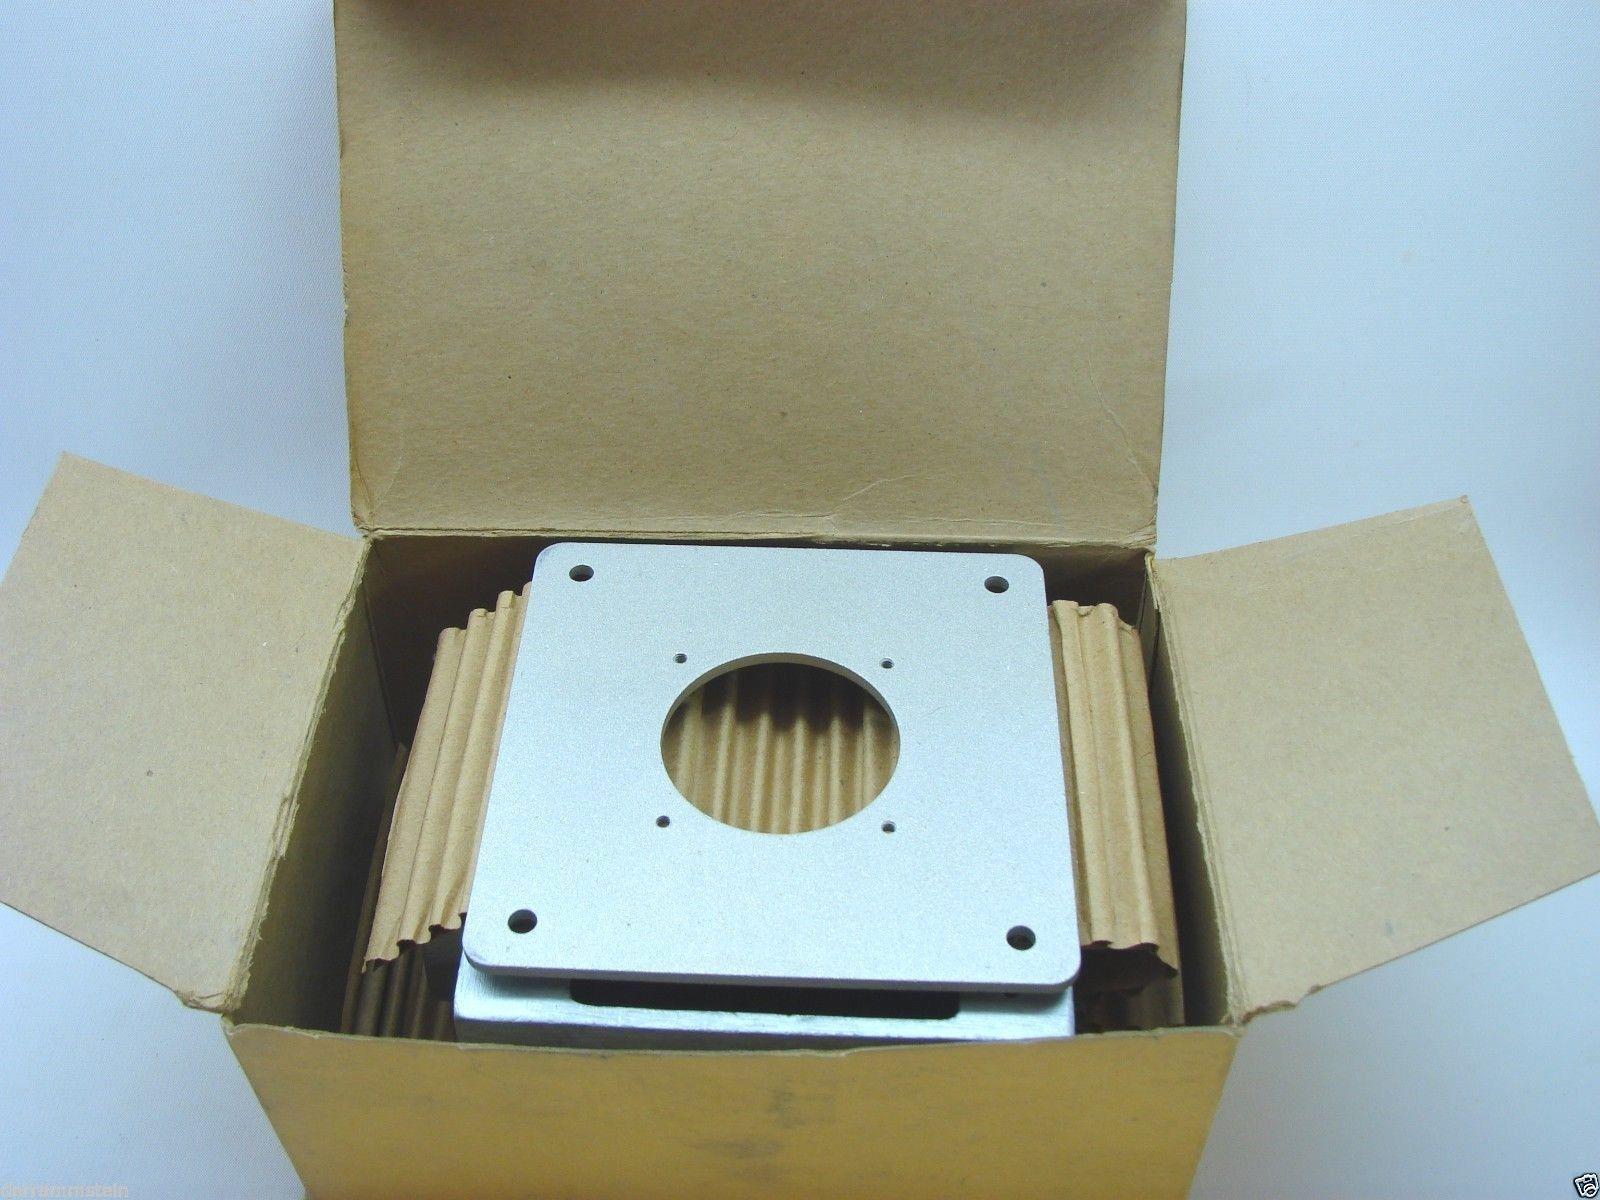 "Hubbell FD20-1 FD Pin & Sleeve Device Back Box 1"" Hubs 2-1/2"" Deep 48 CU.IN.t5/6"